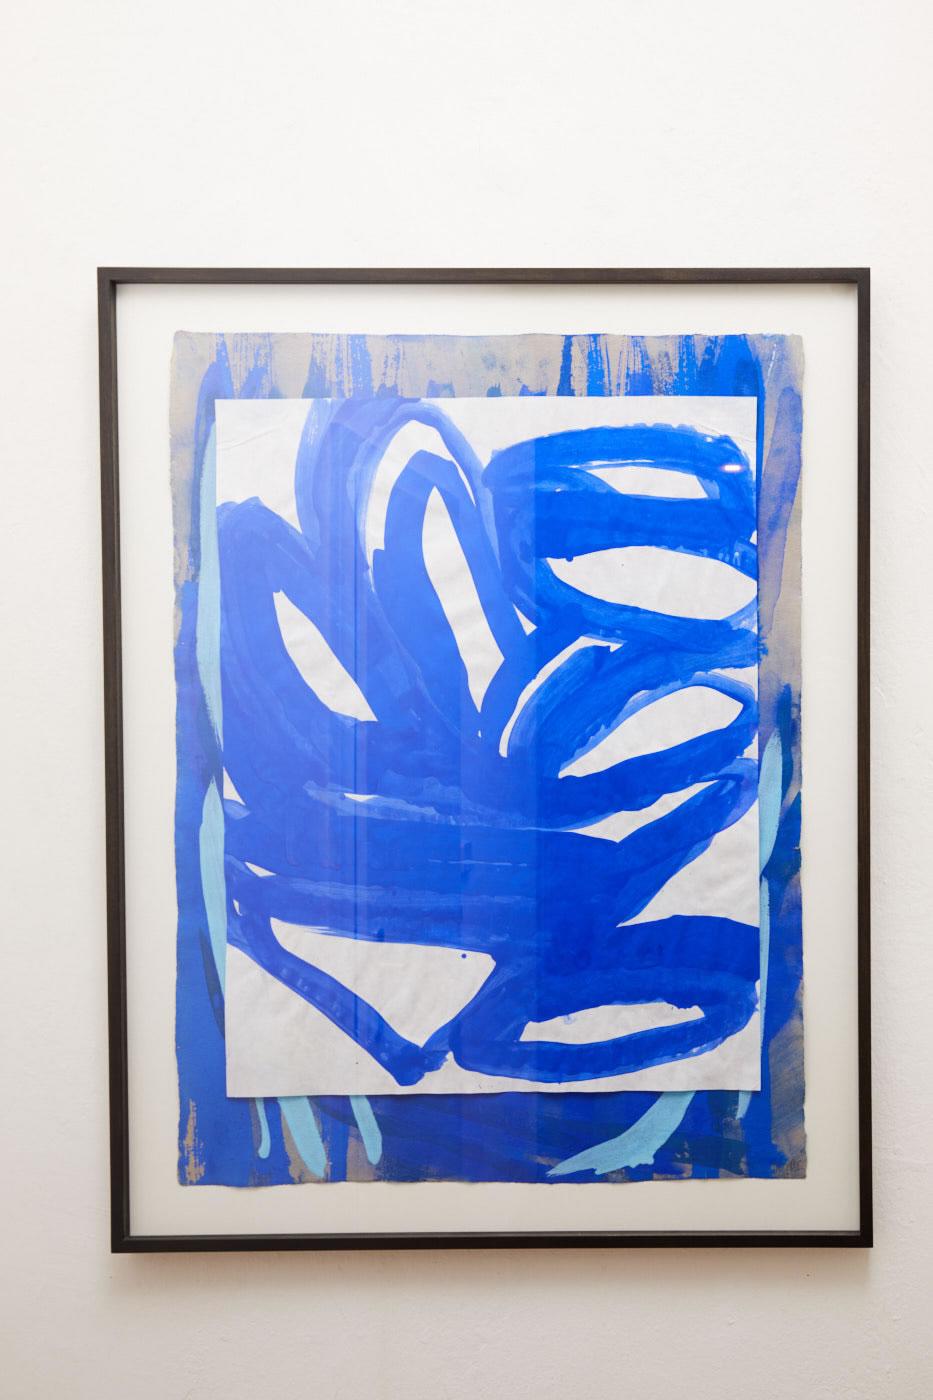 Veronika Dirnhofer | Acryl Collage auf Papier | 90 x 70 cm | Galerie3 | Foto Johannes Puch